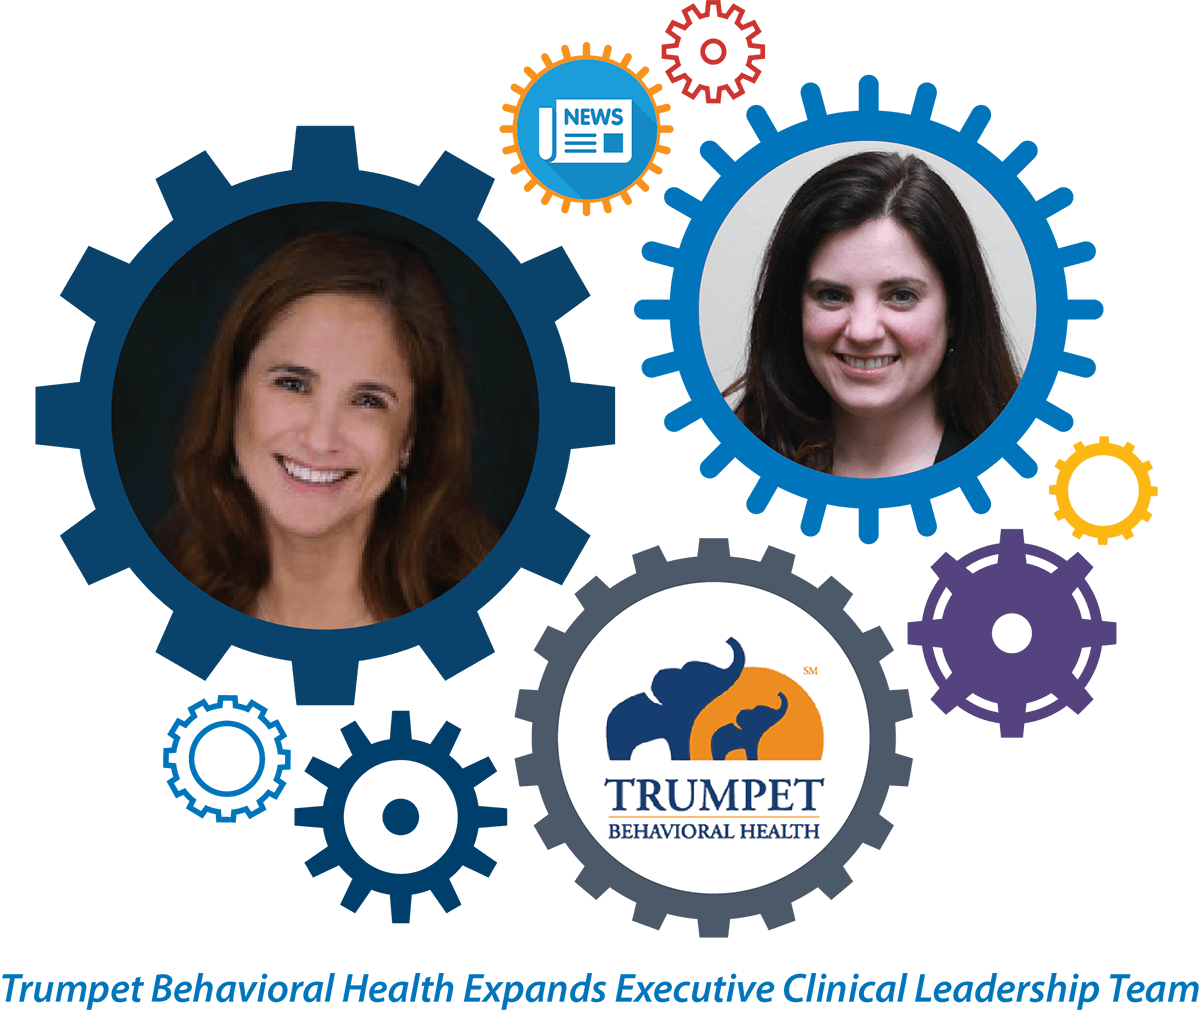 Trumpet Behavioral Health Expands Executive Clinical Leadership Team